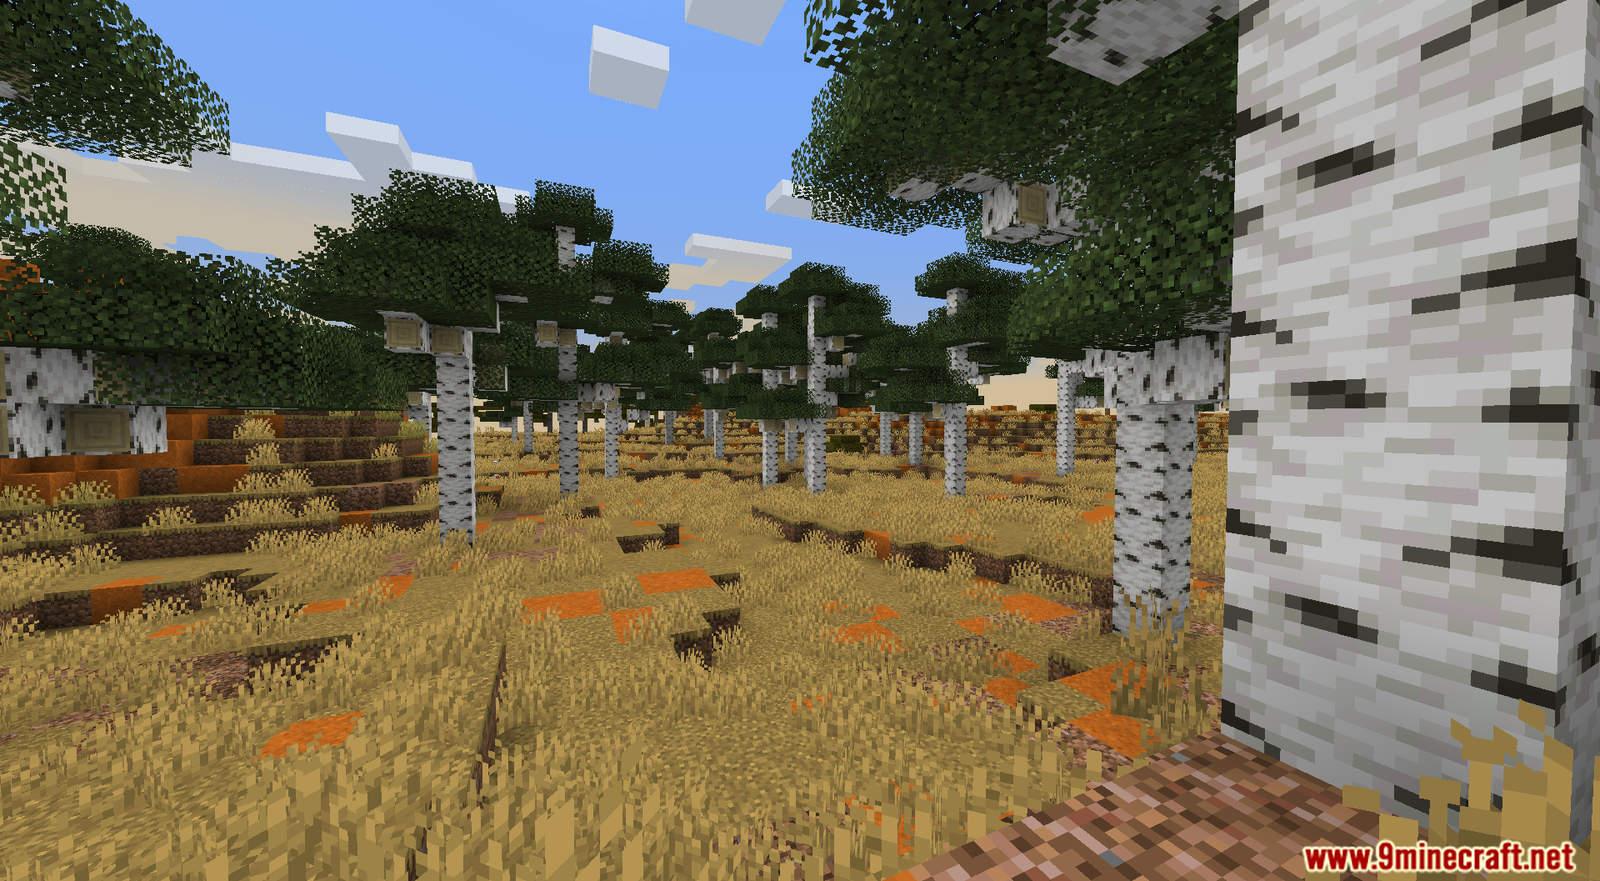 William Wythers' Overhauled Overworld Mod for Minecraft (3)